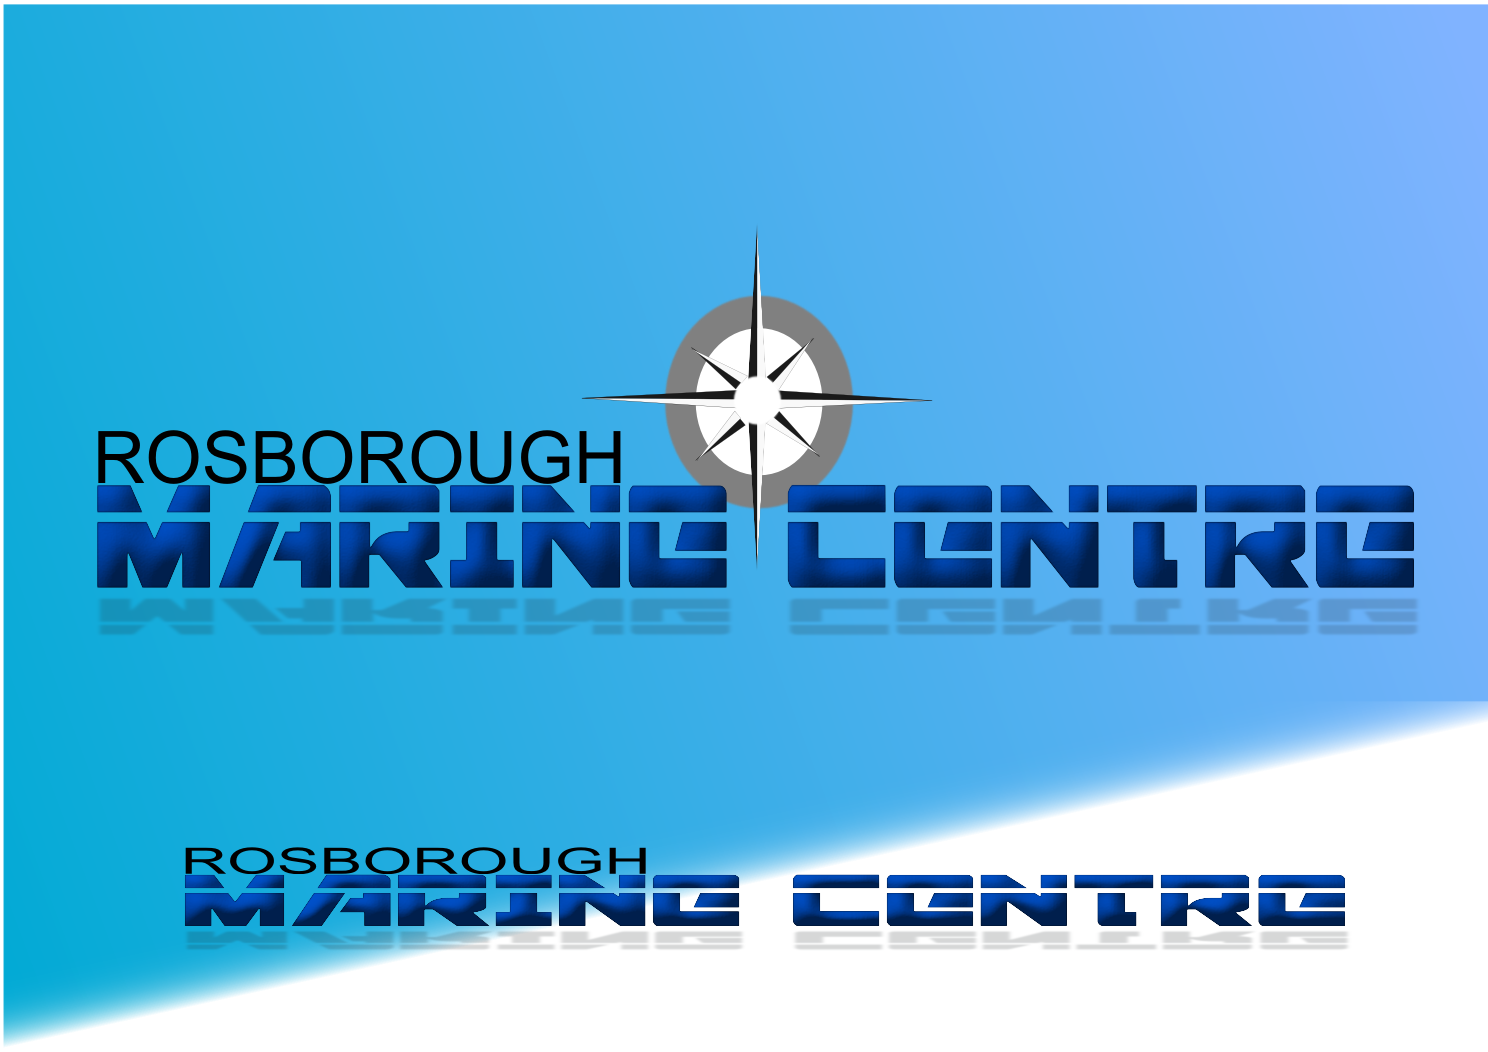 Logo Design by joway - Entry No. 46 in the Logo Design Contest Rosborough Marine Centre Logo Design.